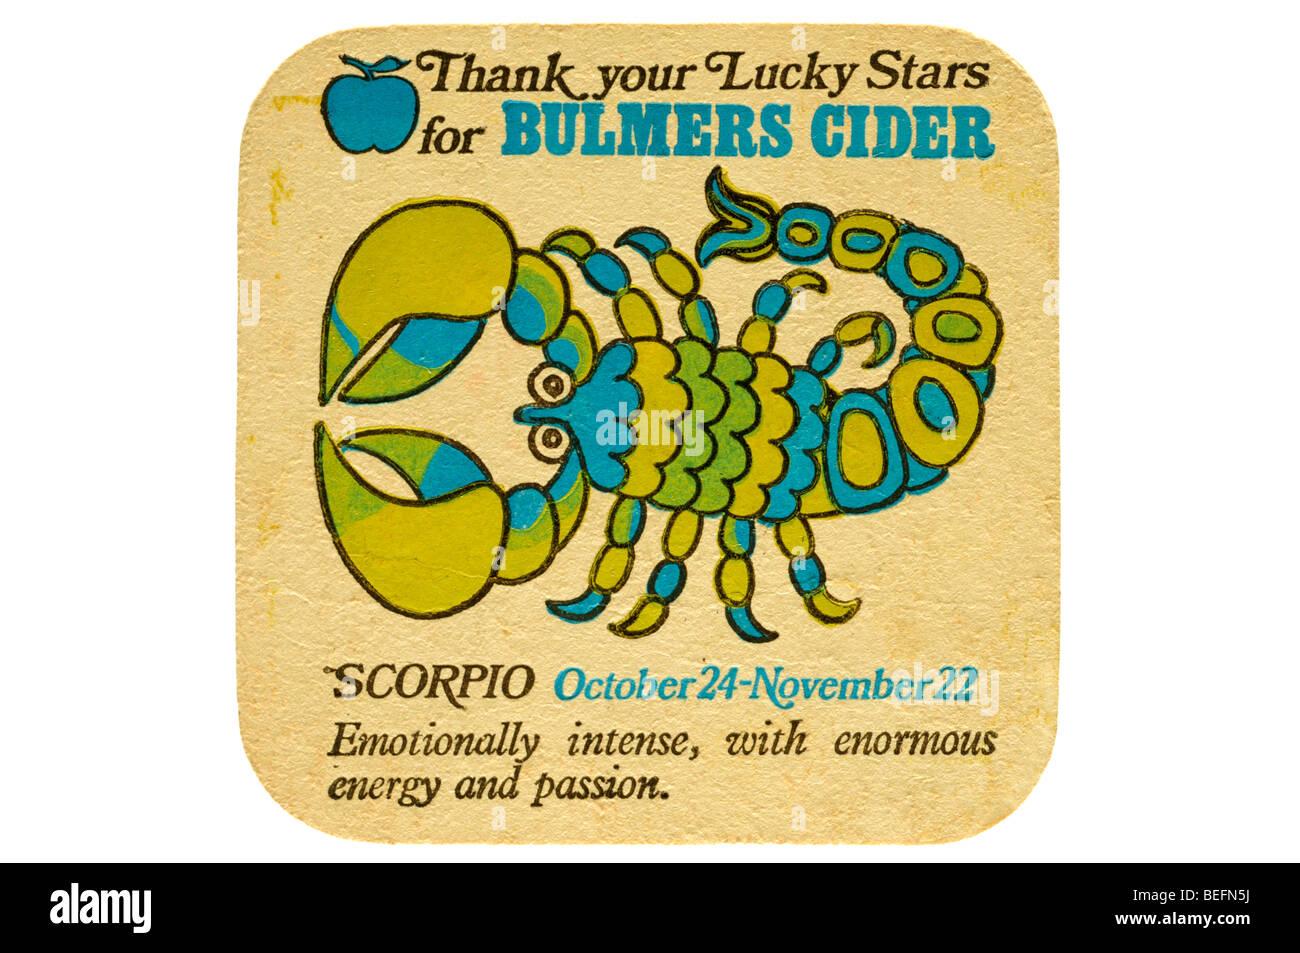 Danke Ihr Glücksstern für Bulmers Cider Skorpion 24. Oktober Movember 22 emotional intensiv mit enormer Stockbild